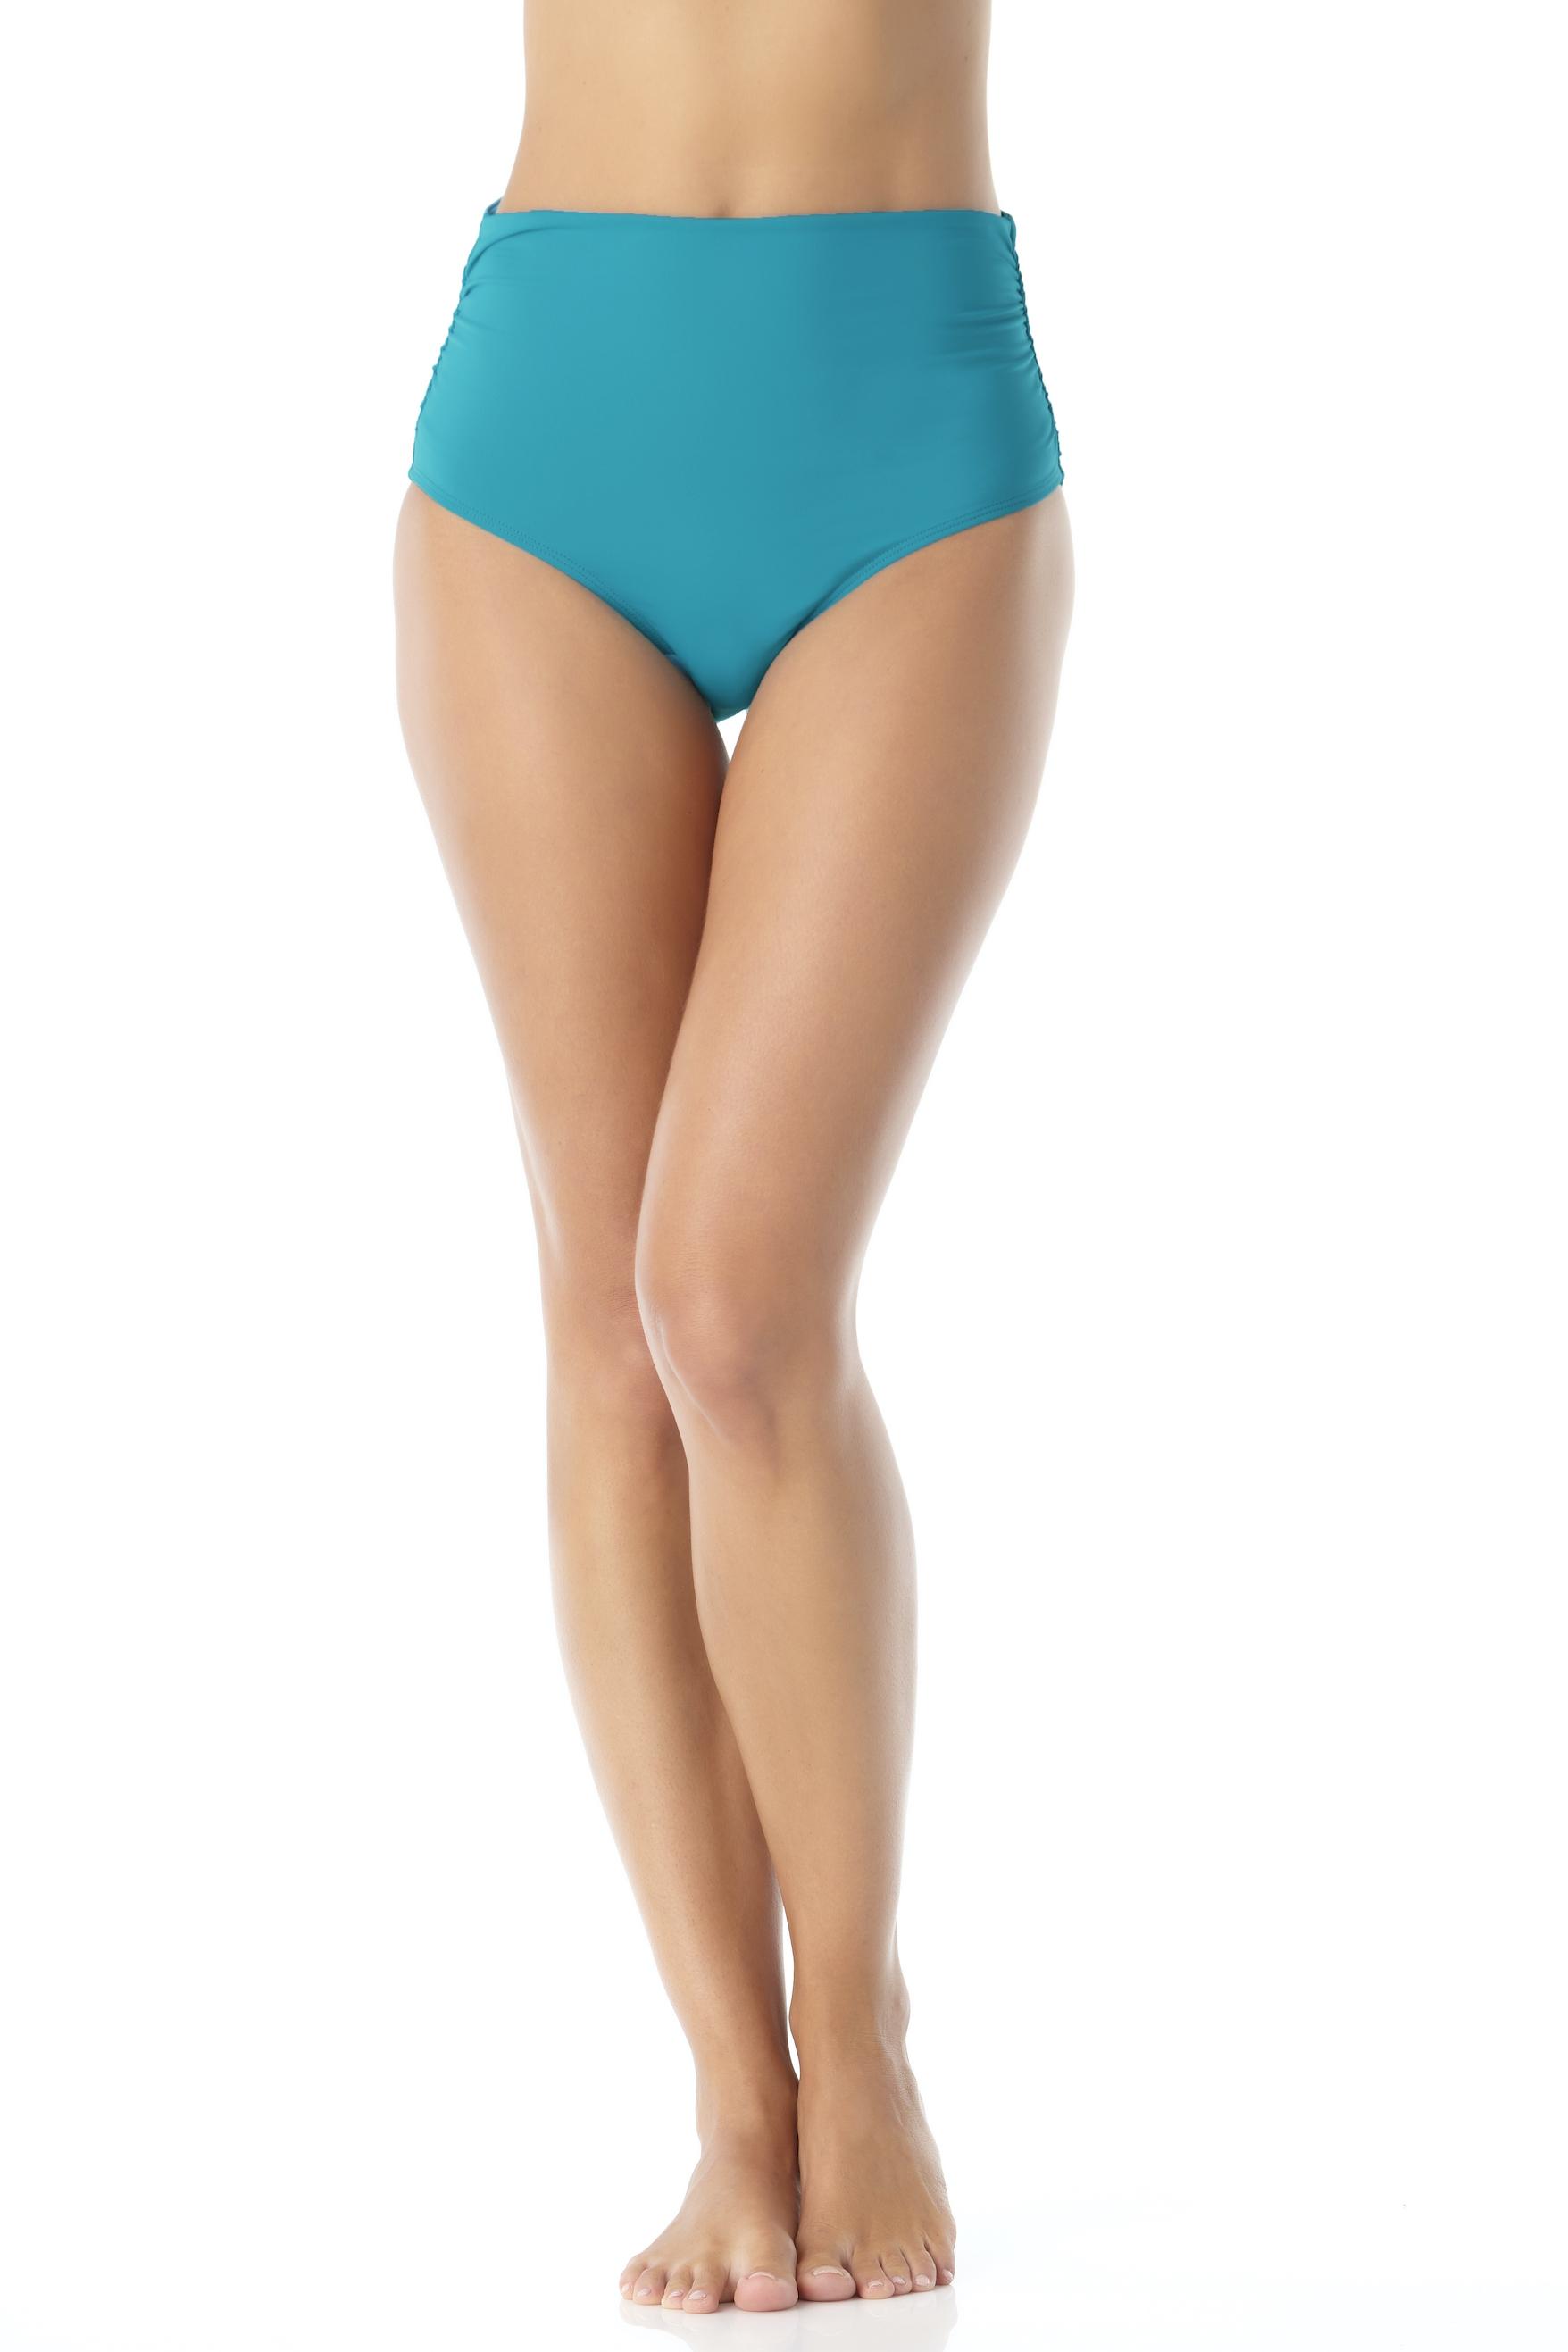 Anne Cole® Live in Color Hi Waist Shirred Bikini Swimsuit Bottom -Caribbean Blue - Front